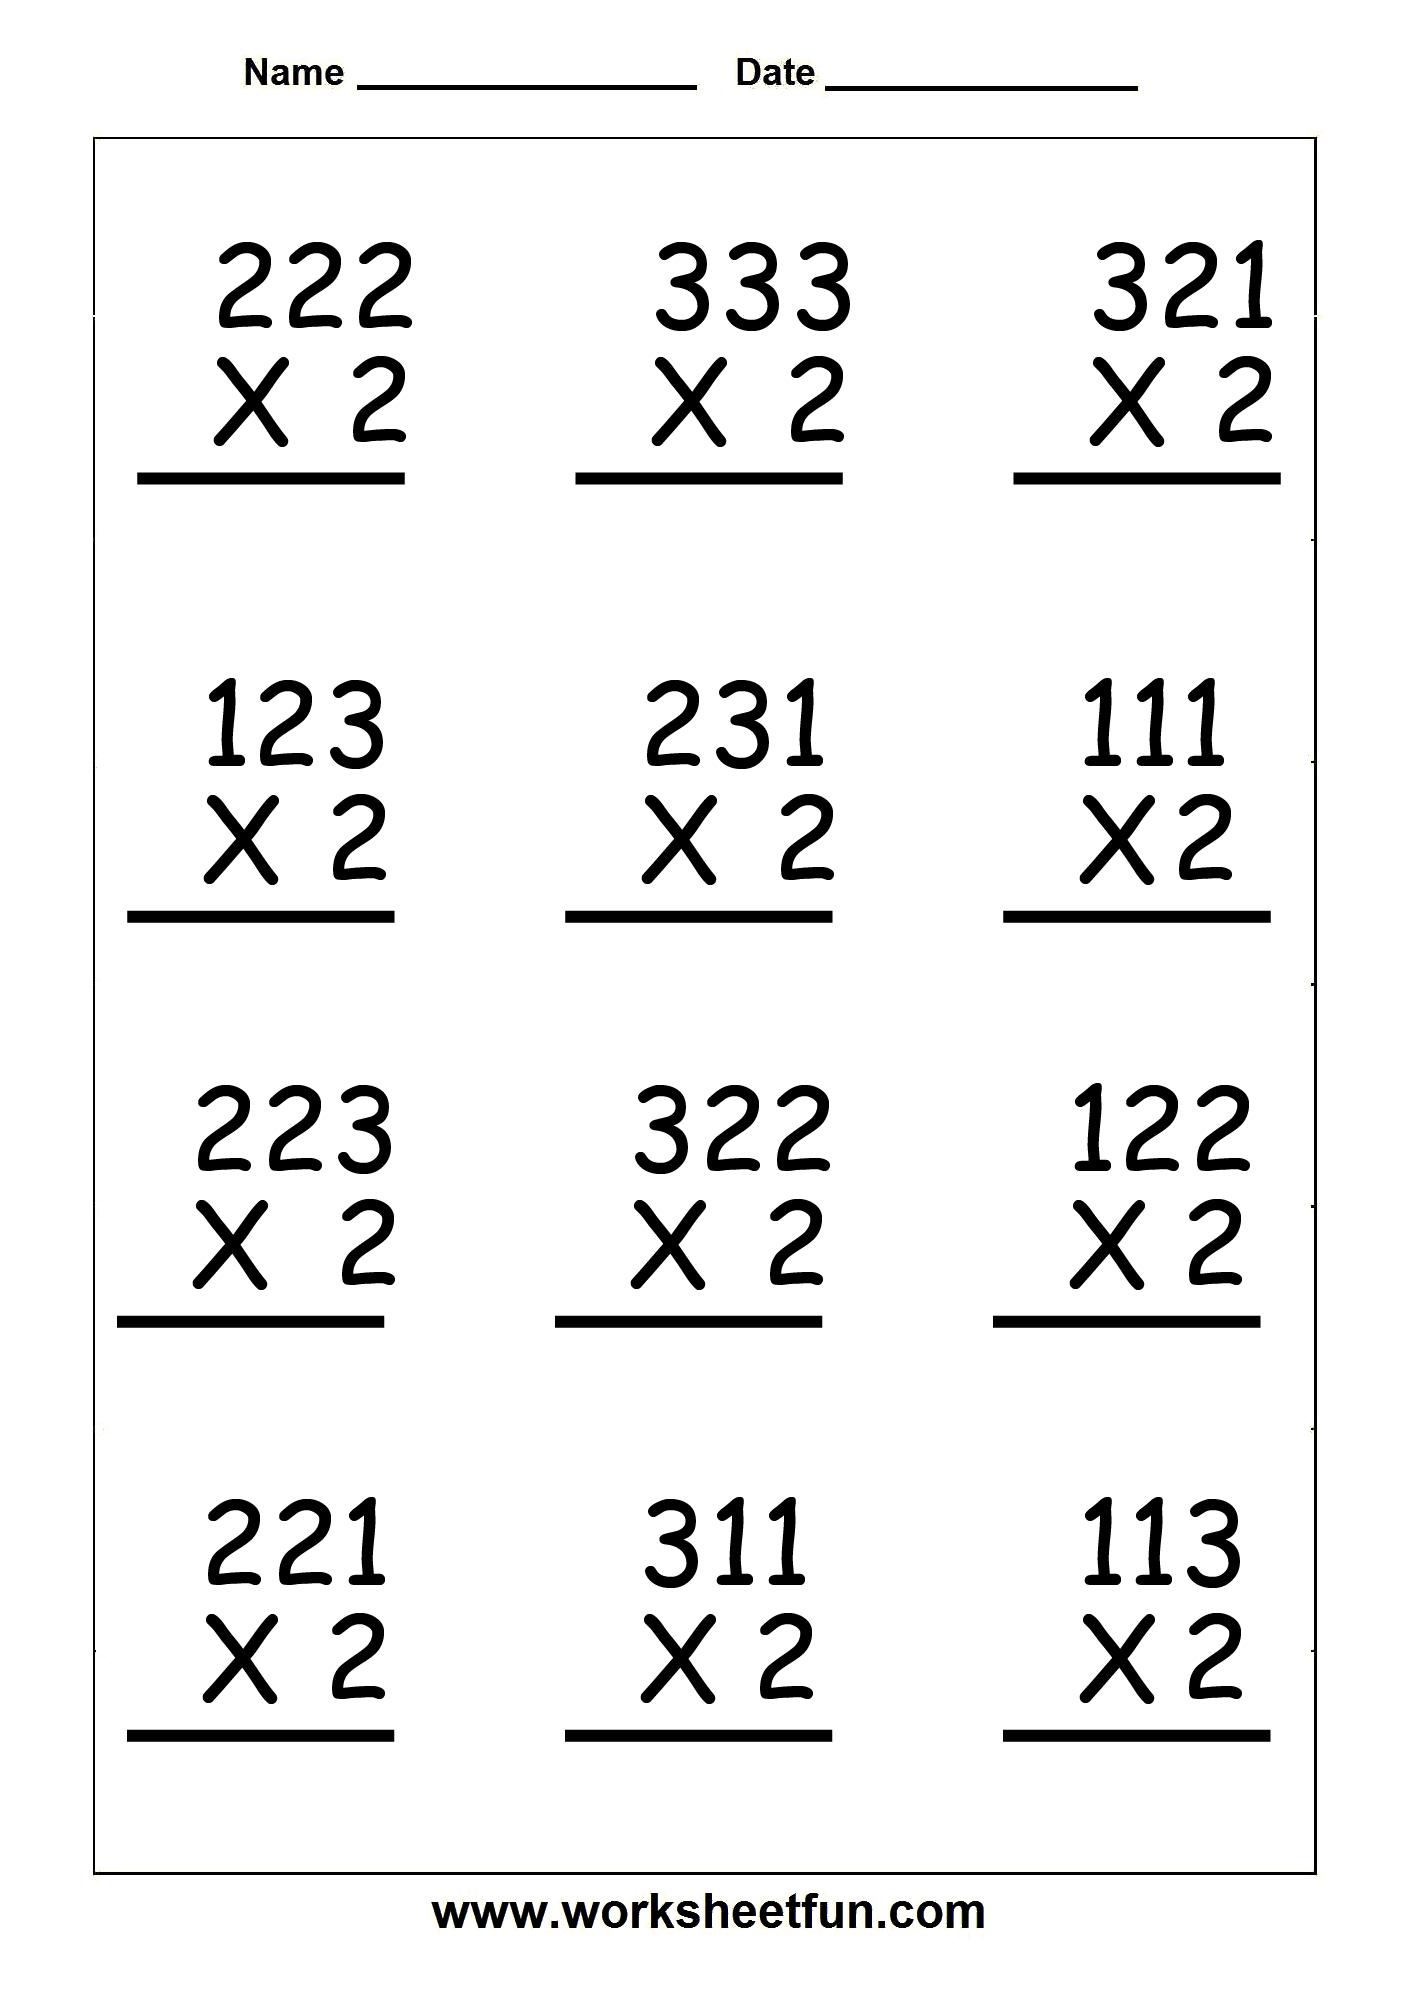 Copy Of Single Digit Multiplication Worksheets - Lessons pertaining to Multiplication Worksheets 3 Digit